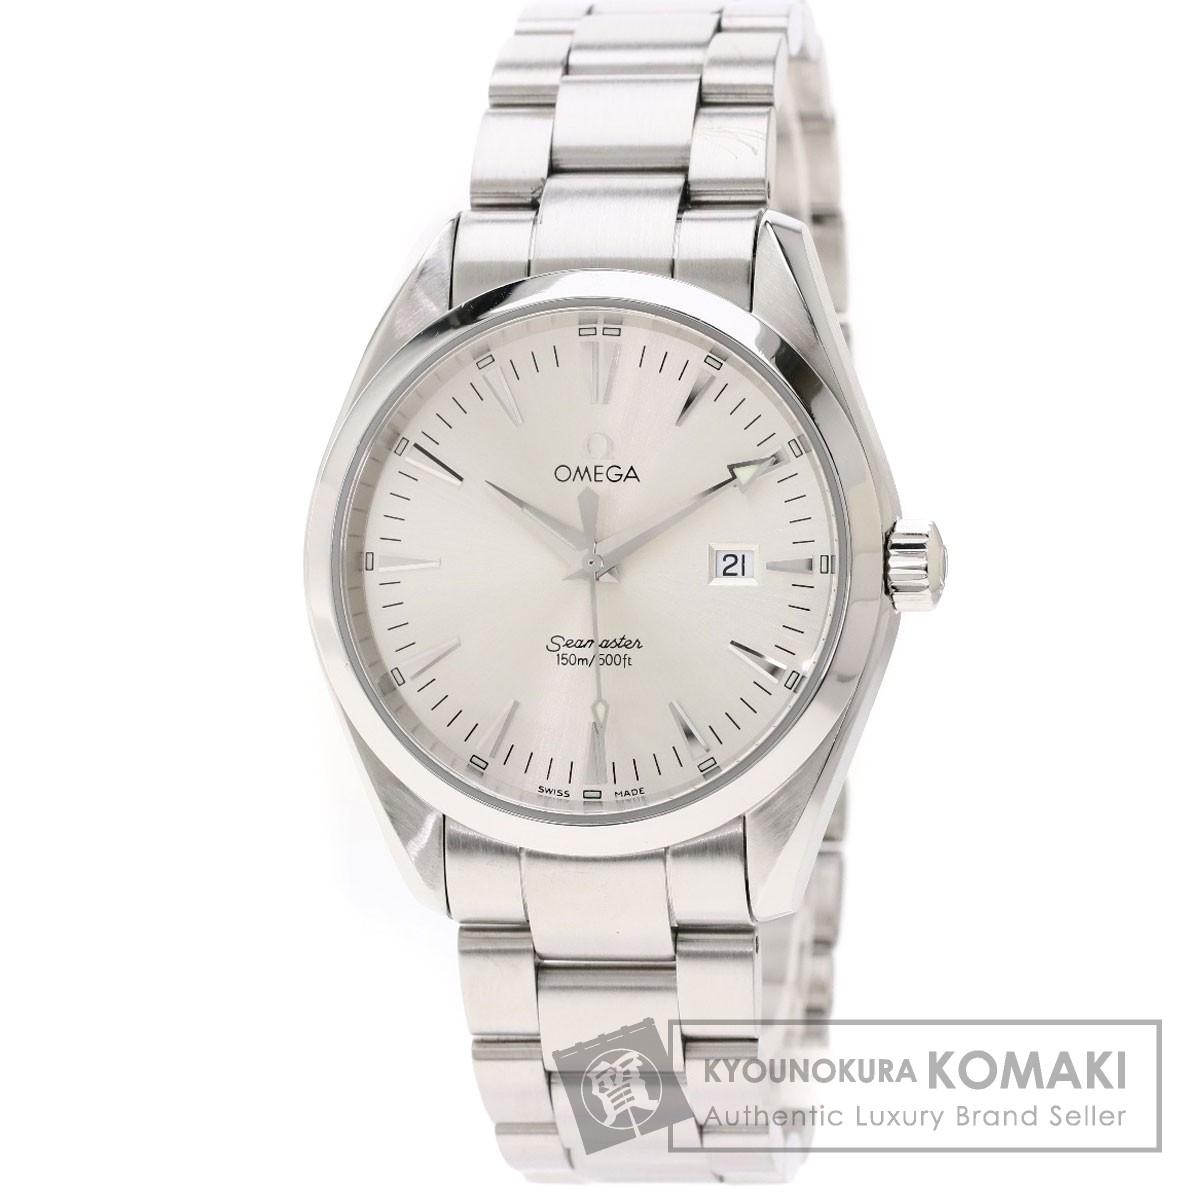 brand new 924b8 6a531 オメガ 2517.30.00 シーマスター アクアテラ 腕時計 ステンレス ...